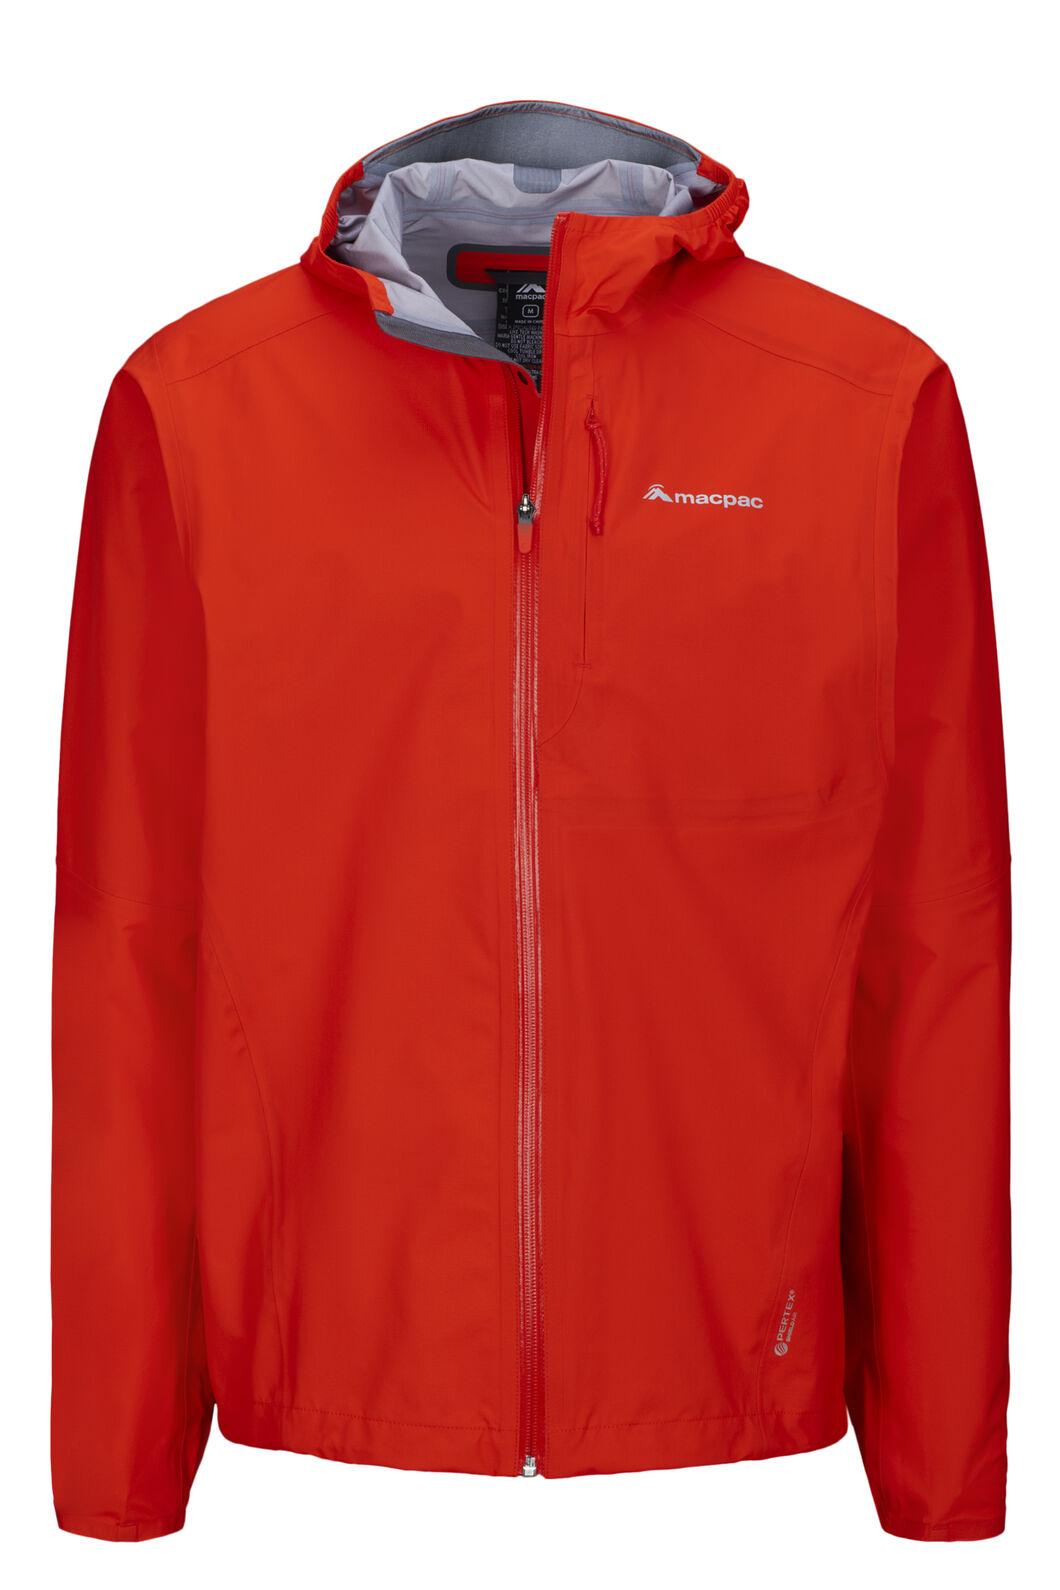 Macpac Men's Tempo Pertex® Rain Jacket, Indicator, hi-res